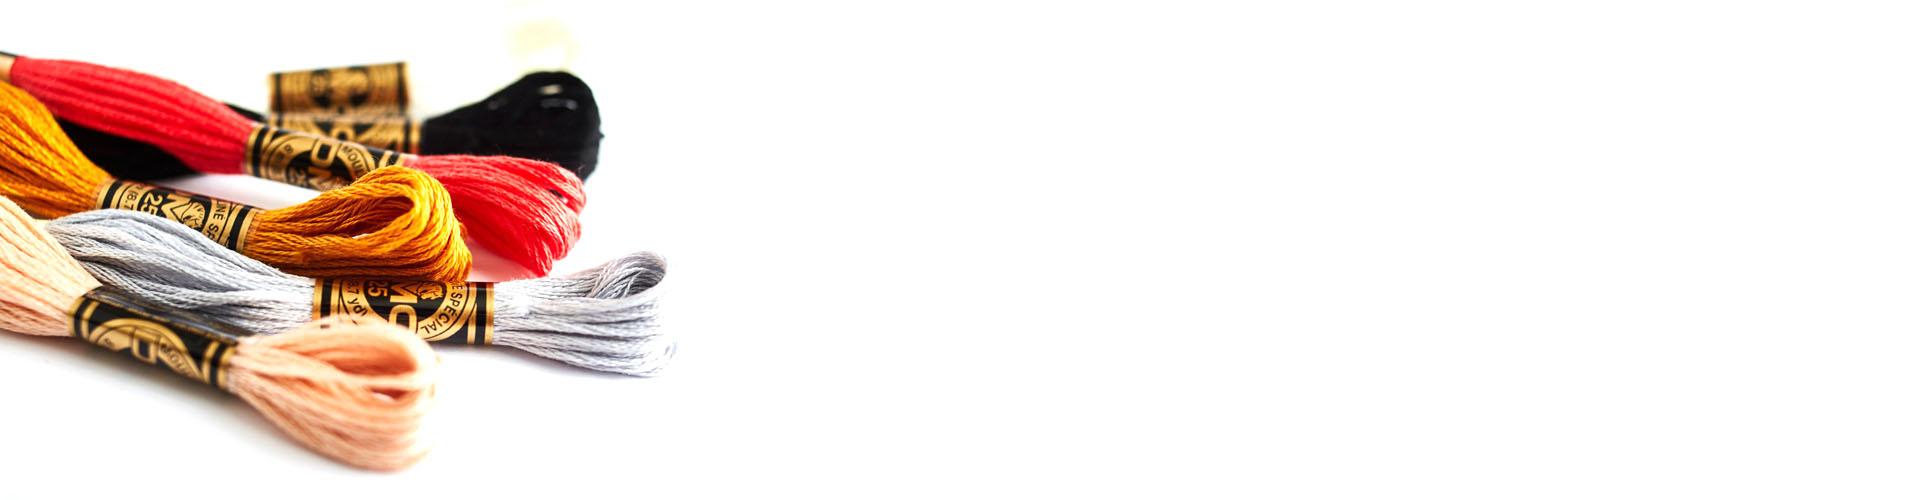 489 WARNA DARI DMC EMBROIDERY FLOSS